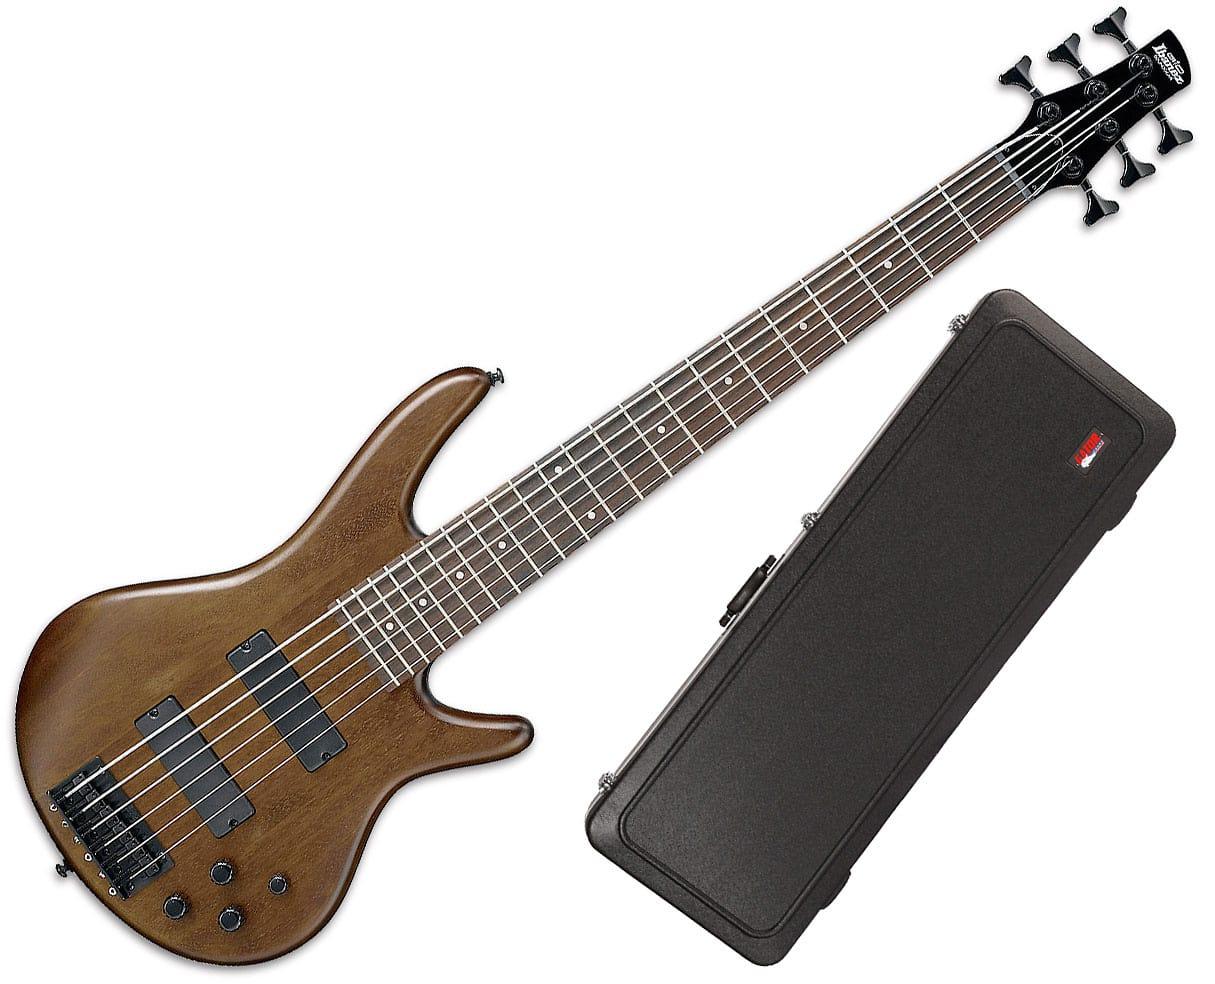 ibanez gsr206b 6 string bass guitar walnut flat with gator reverb. Black Bedroom Furniture Sets. Home Design Ideas